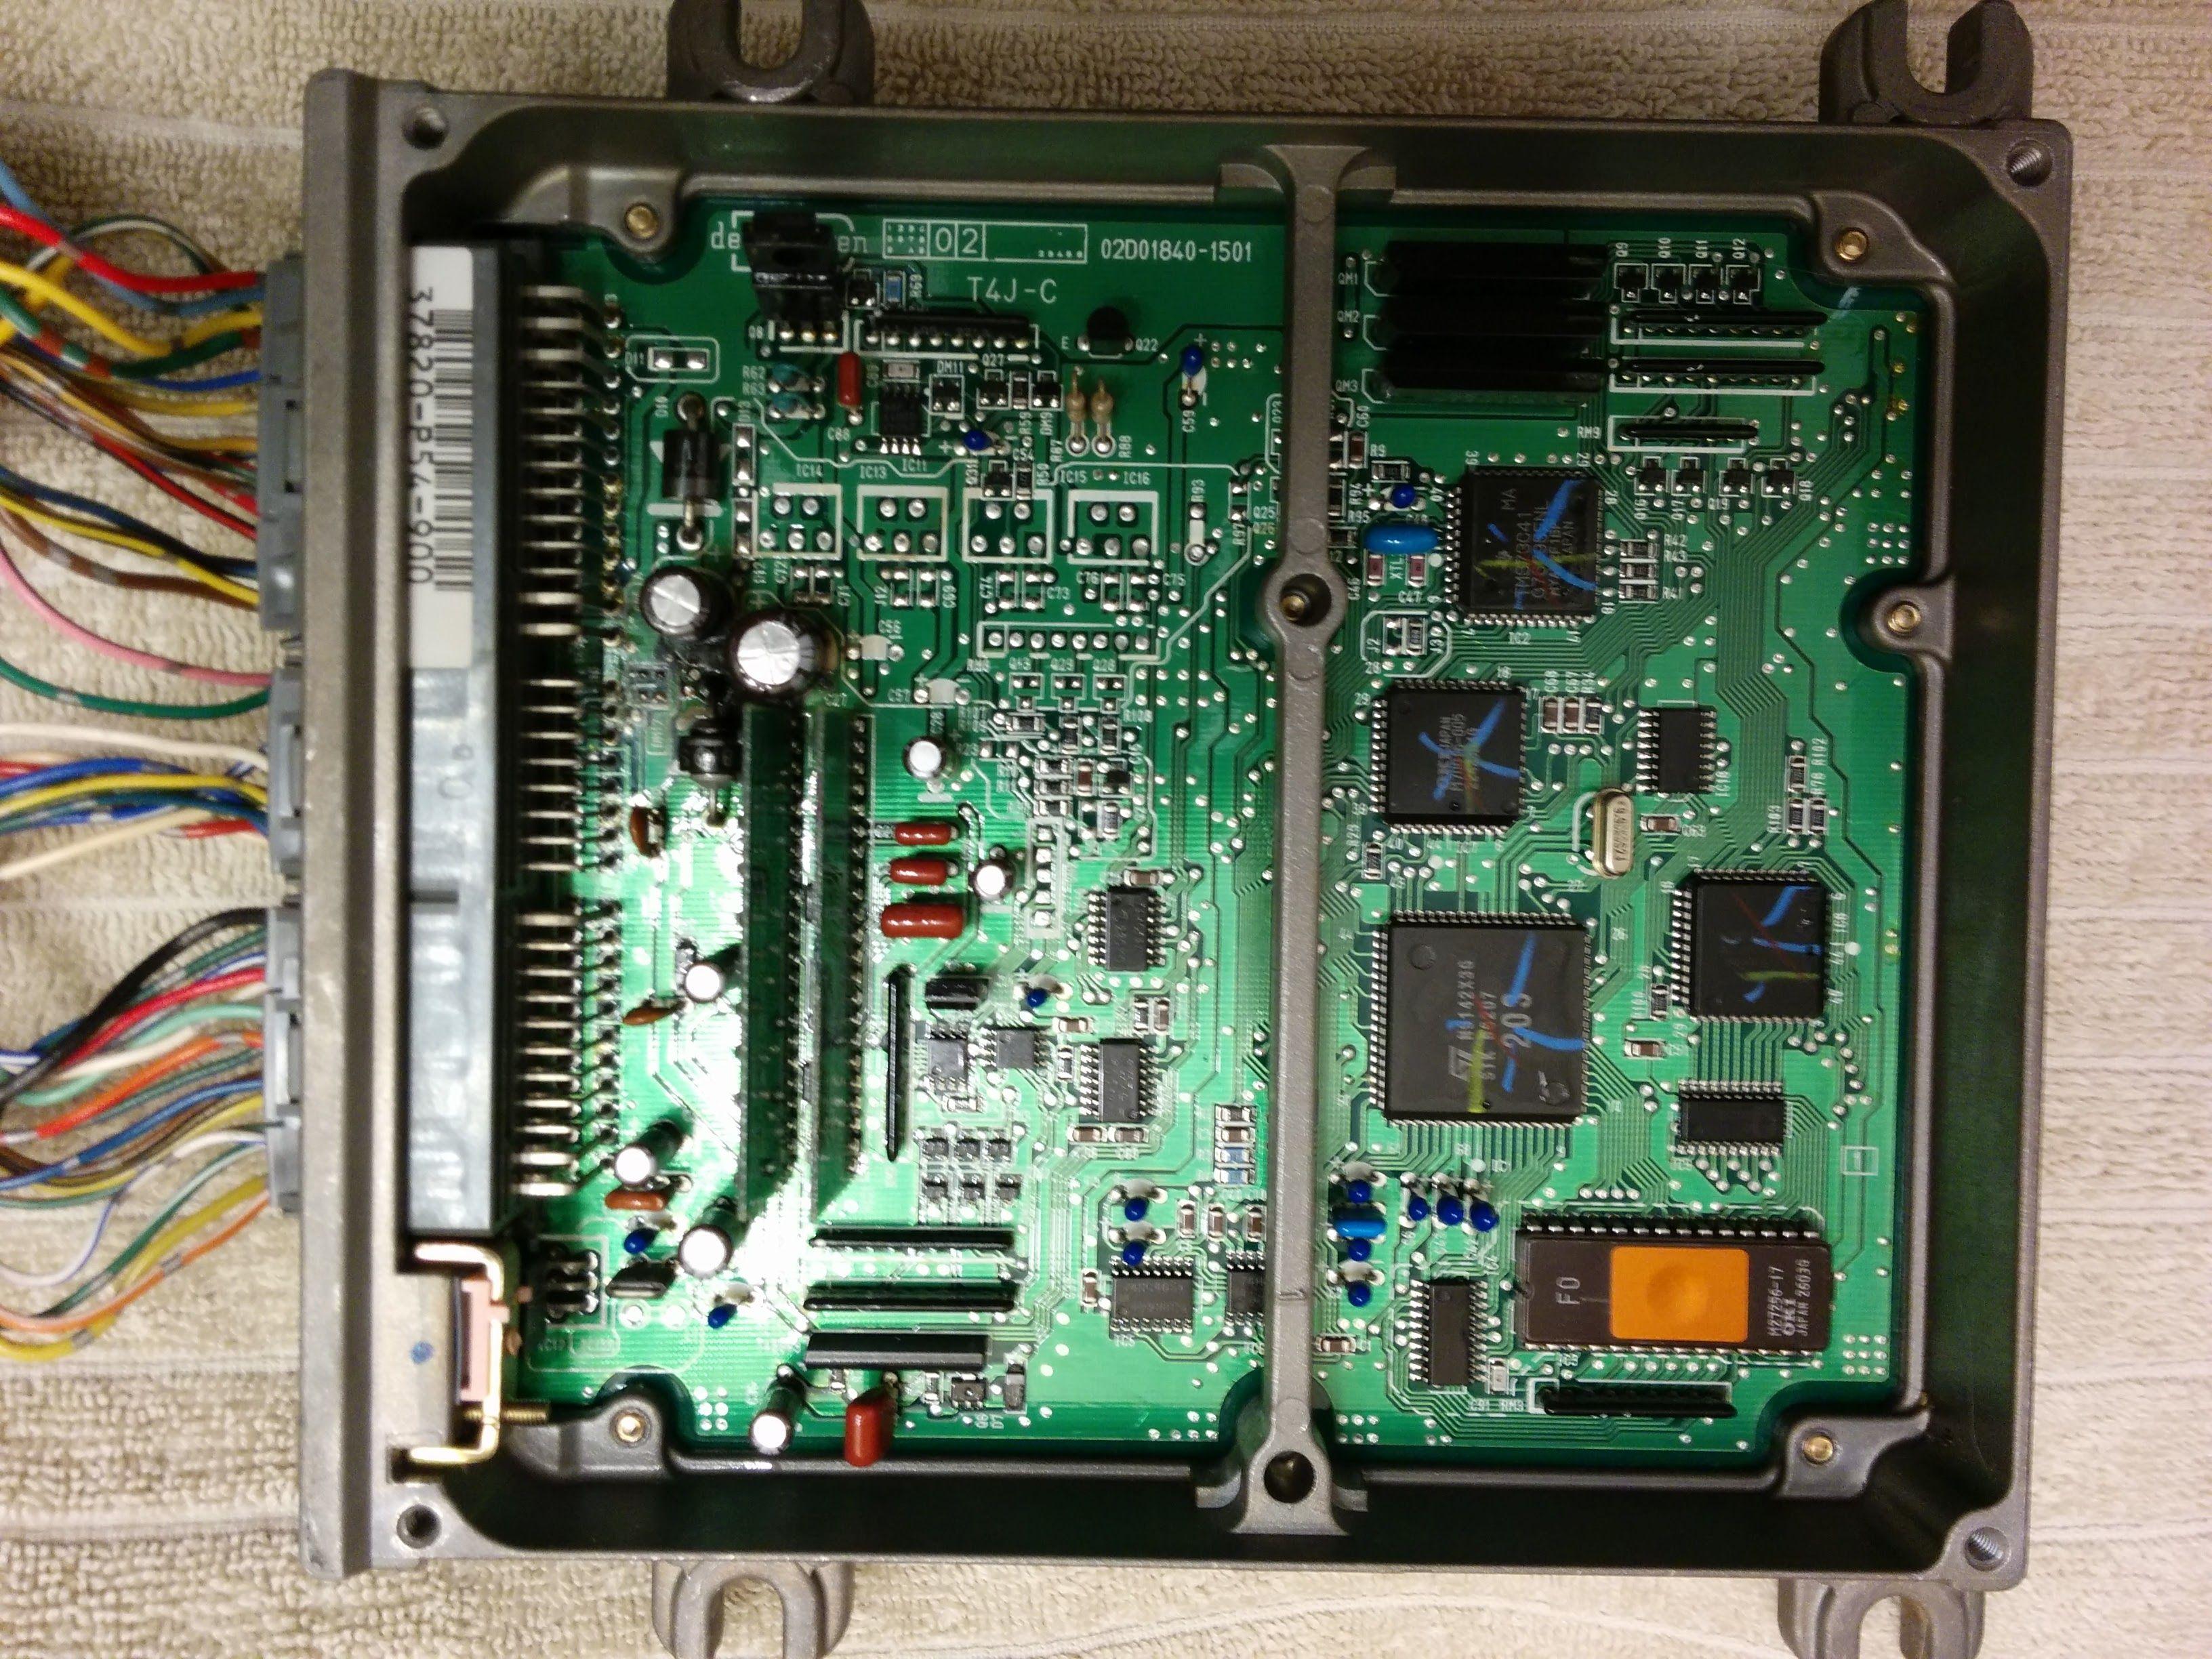 P54-900 ECU Whole.jpg